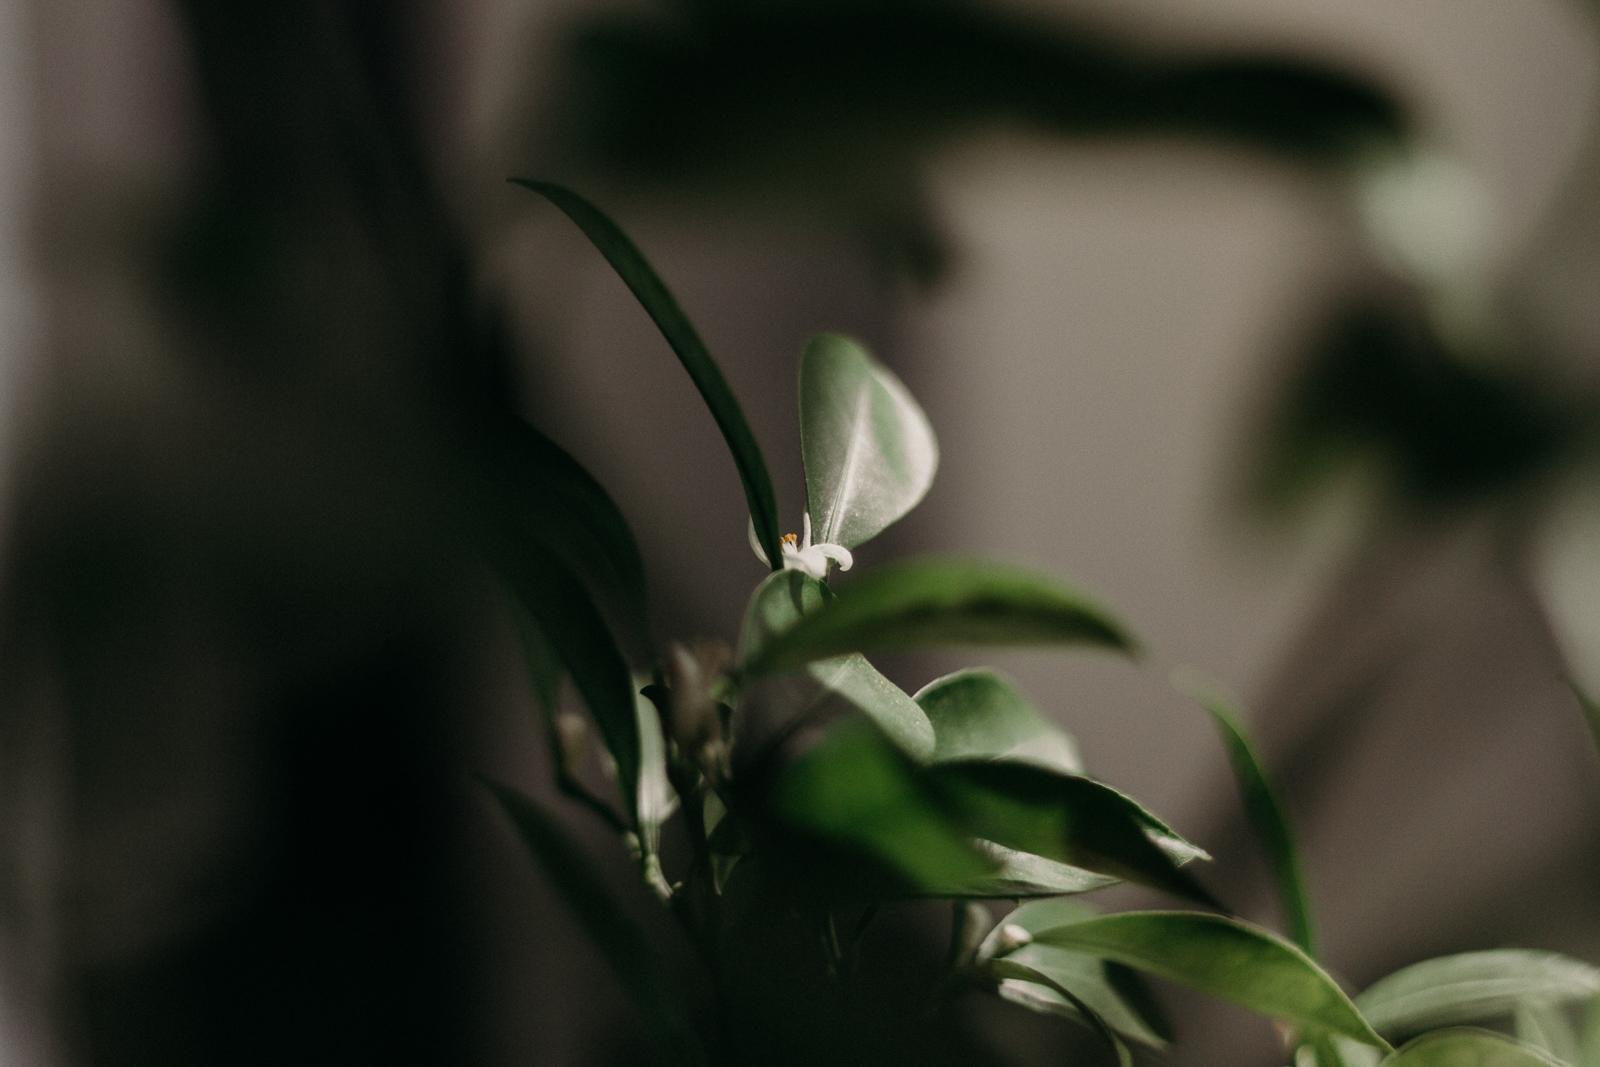 Wiosenna pobudka